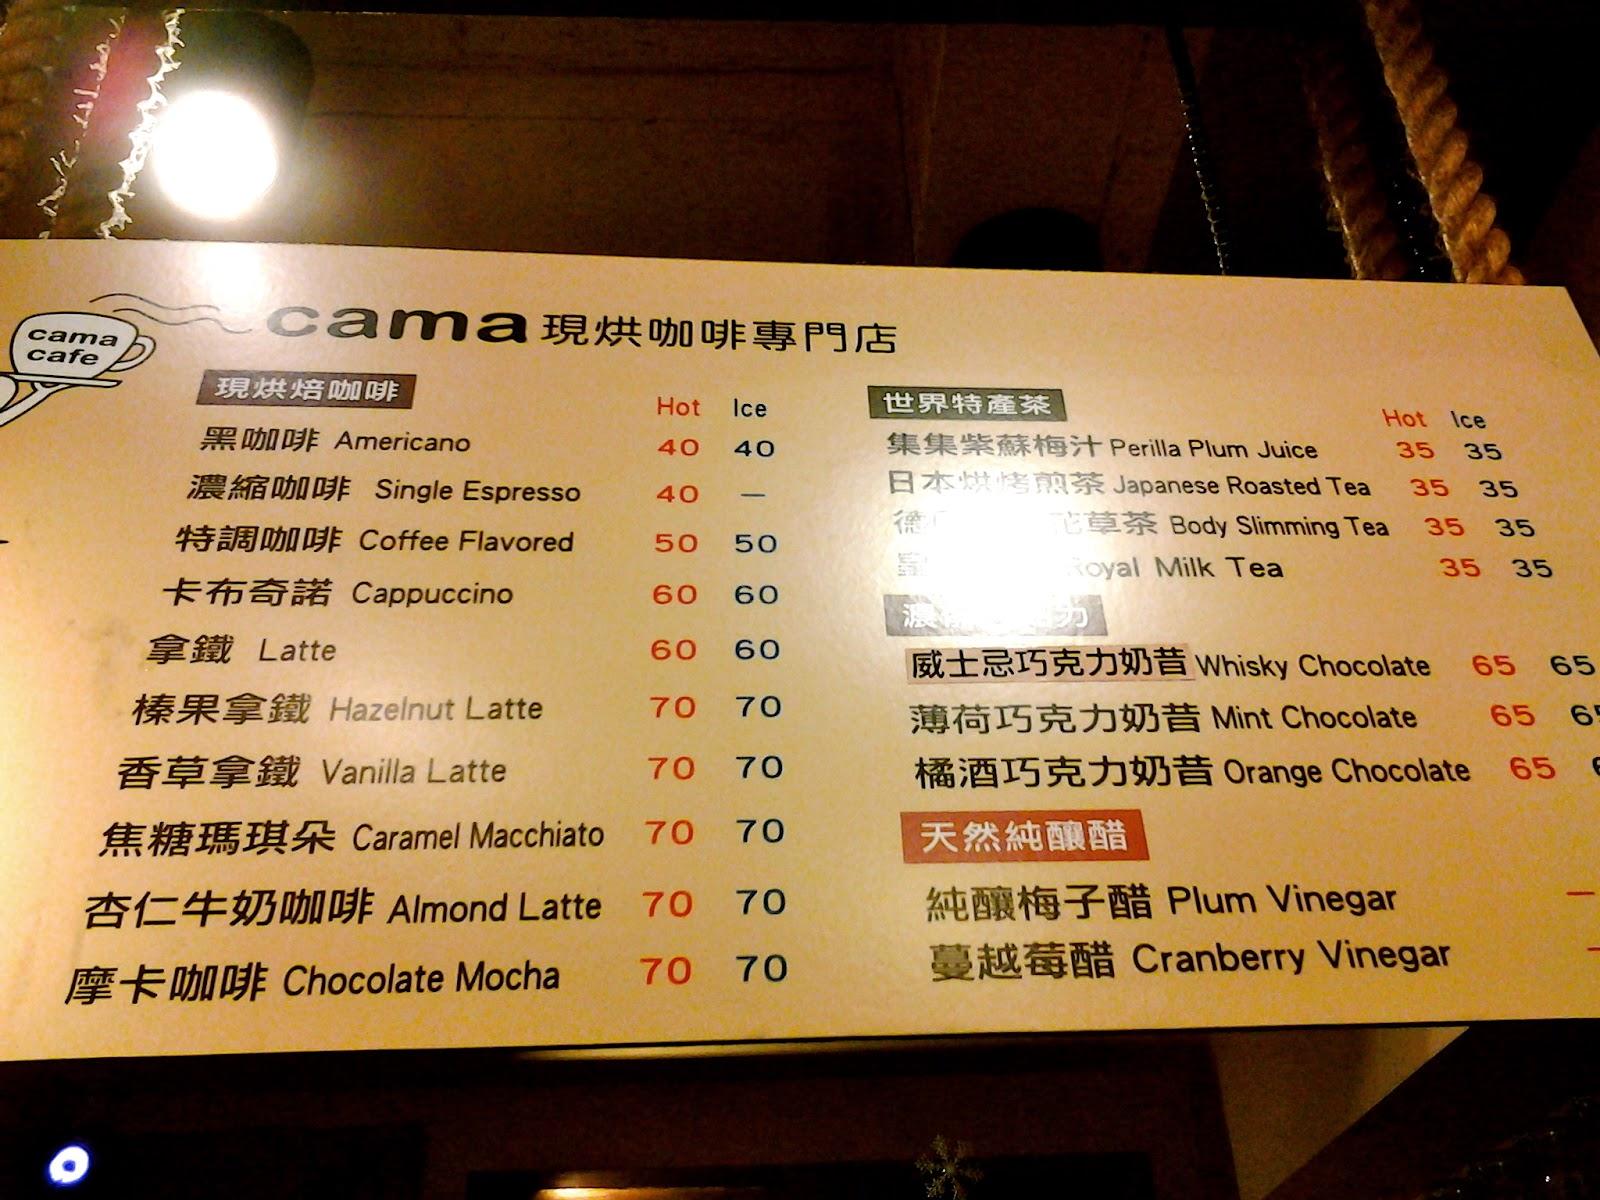 Cama Cafe Taiwan Menu